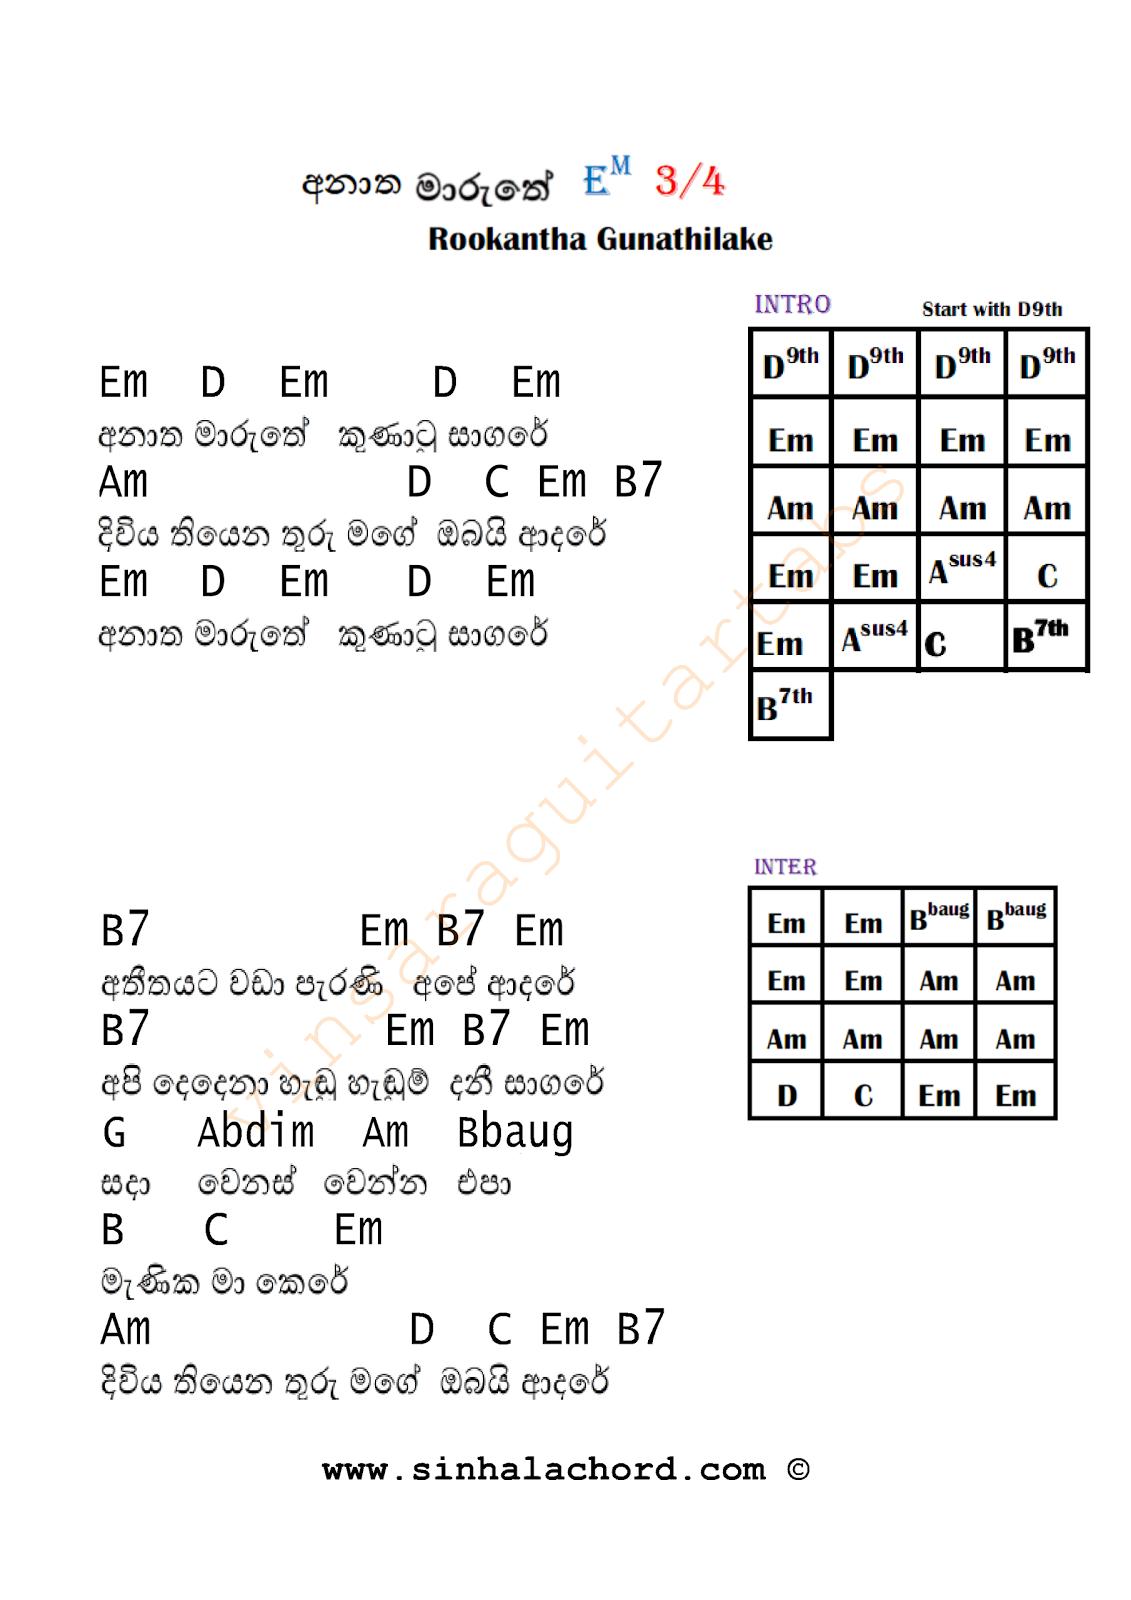 Anatha Maruthe Rookantha Gunathilake Sinhala Guitar Chords